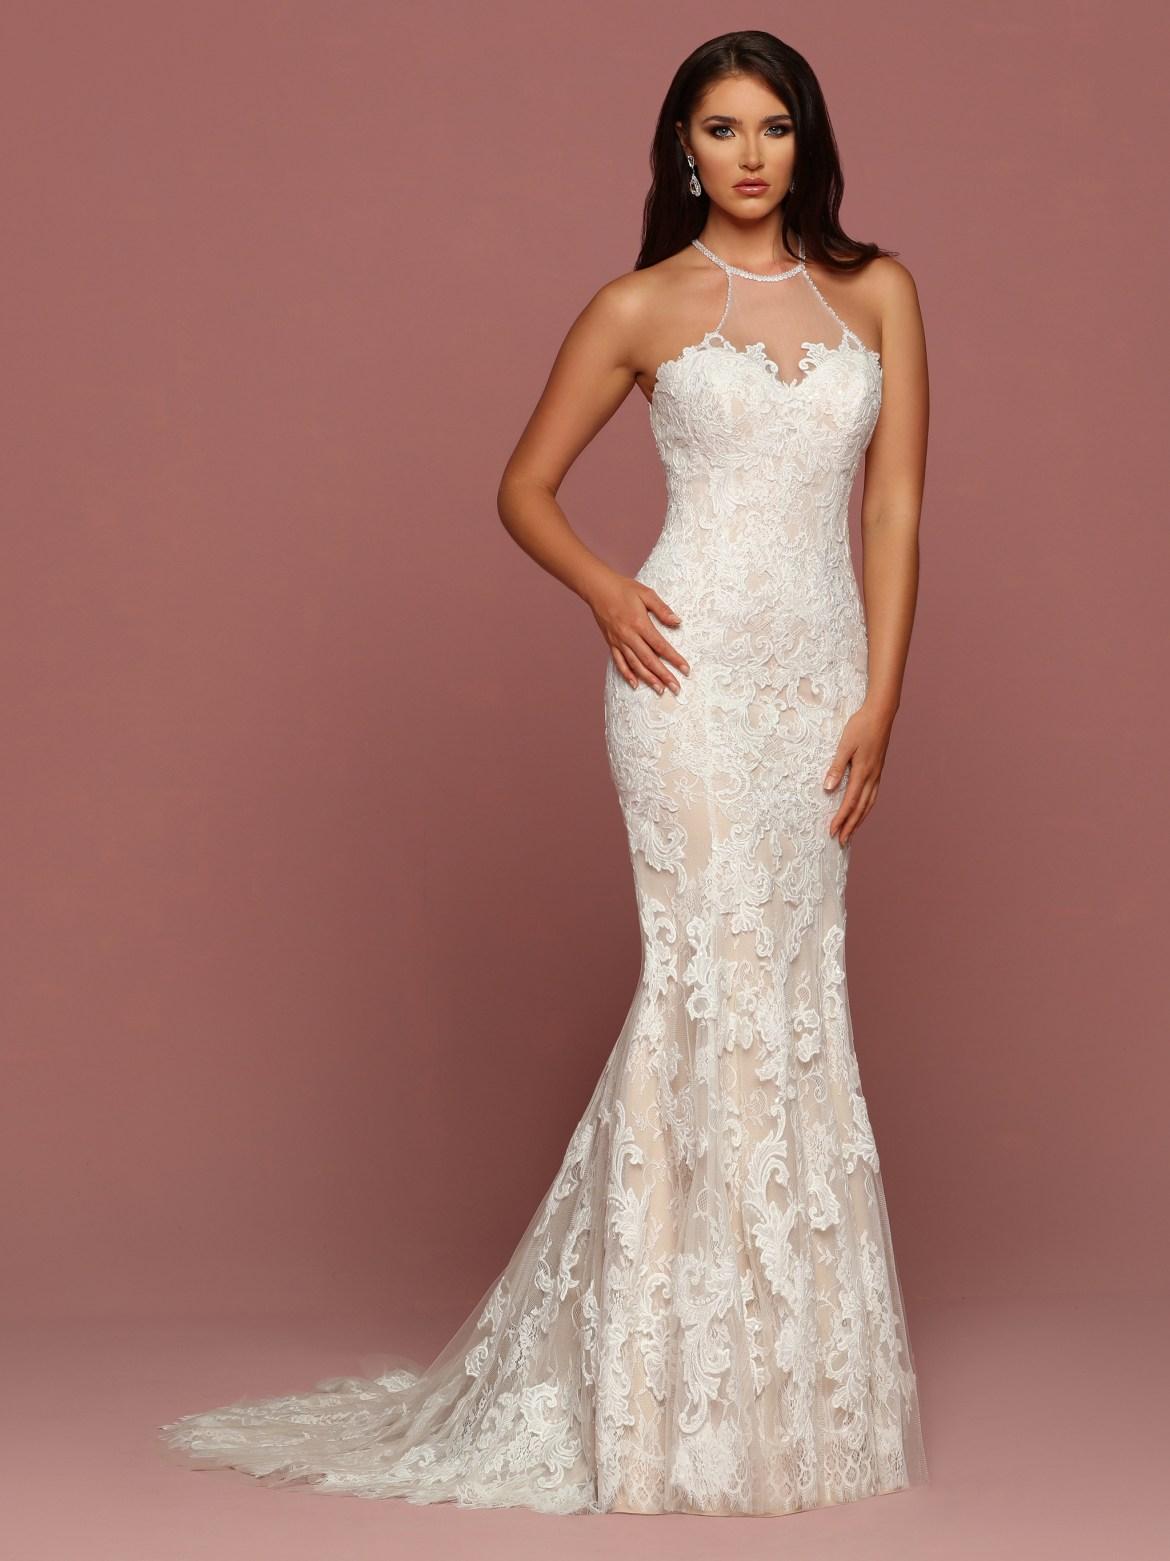 Lovely Illusion: Sheer Bodice Wedding Dresses - 2018 DaVinci Bridal Blog